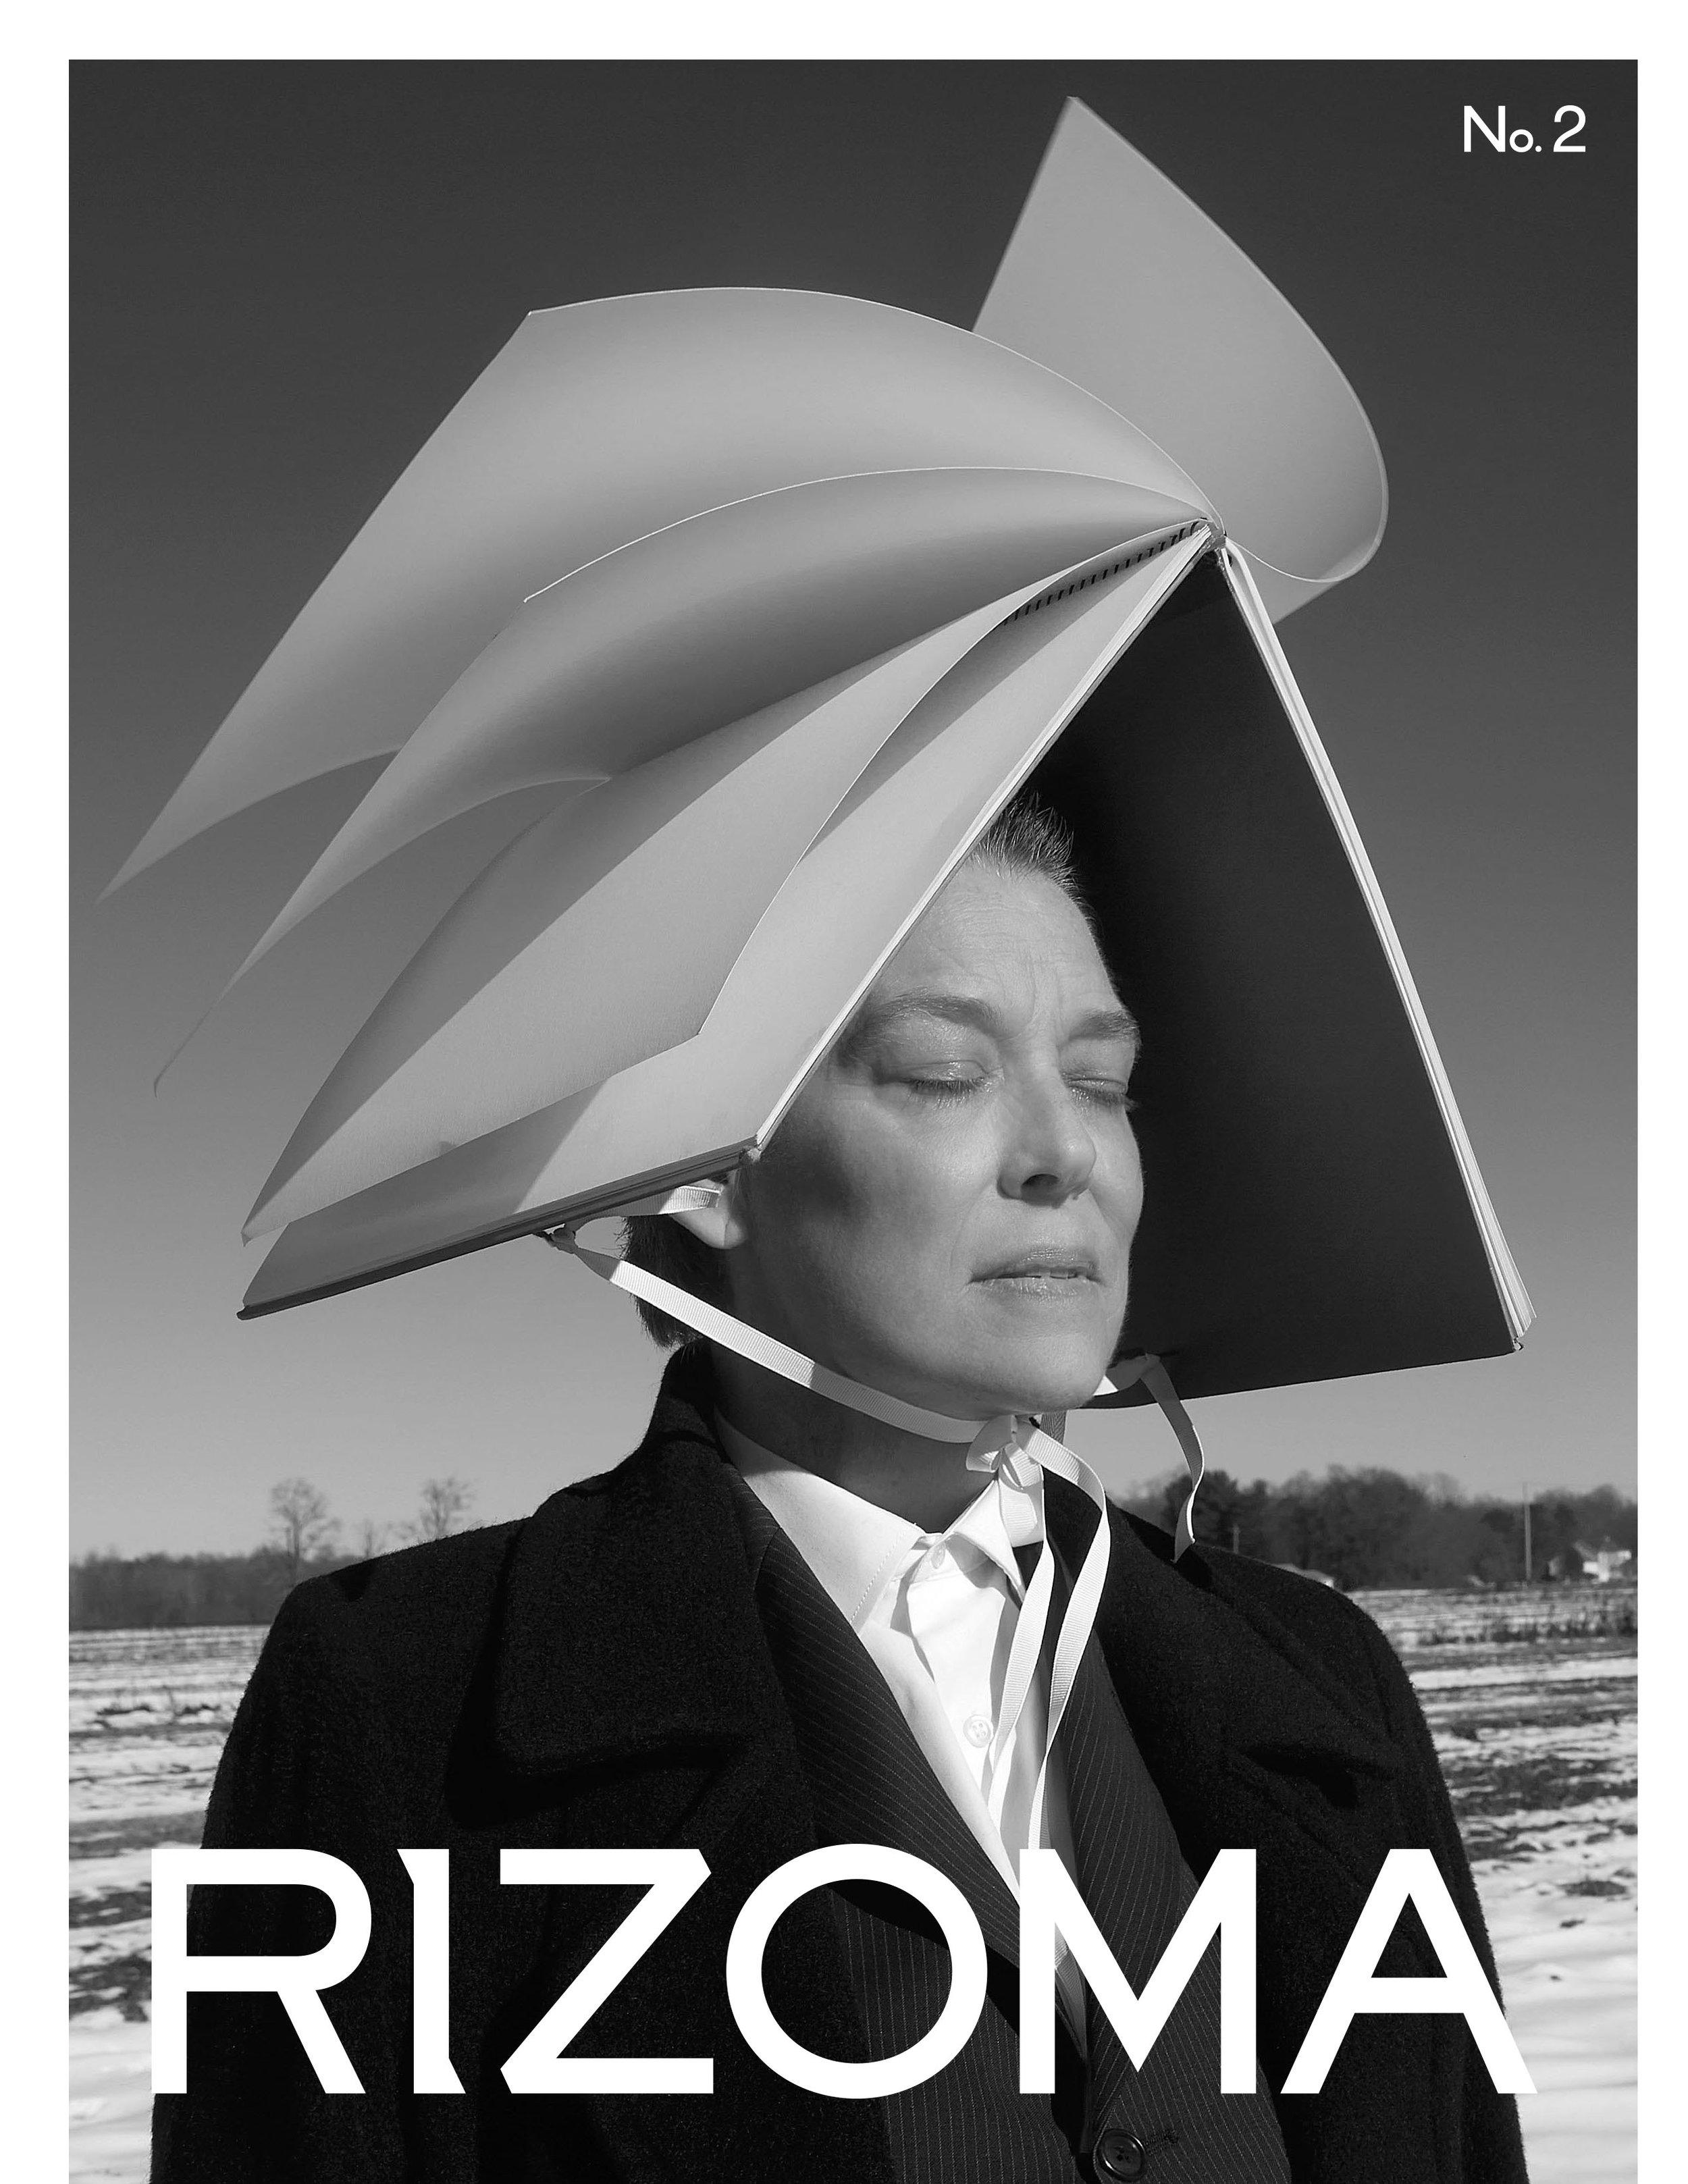 3Q3RHIZOME-COVER-TEMPLATE 3.21.15 PM.jpg